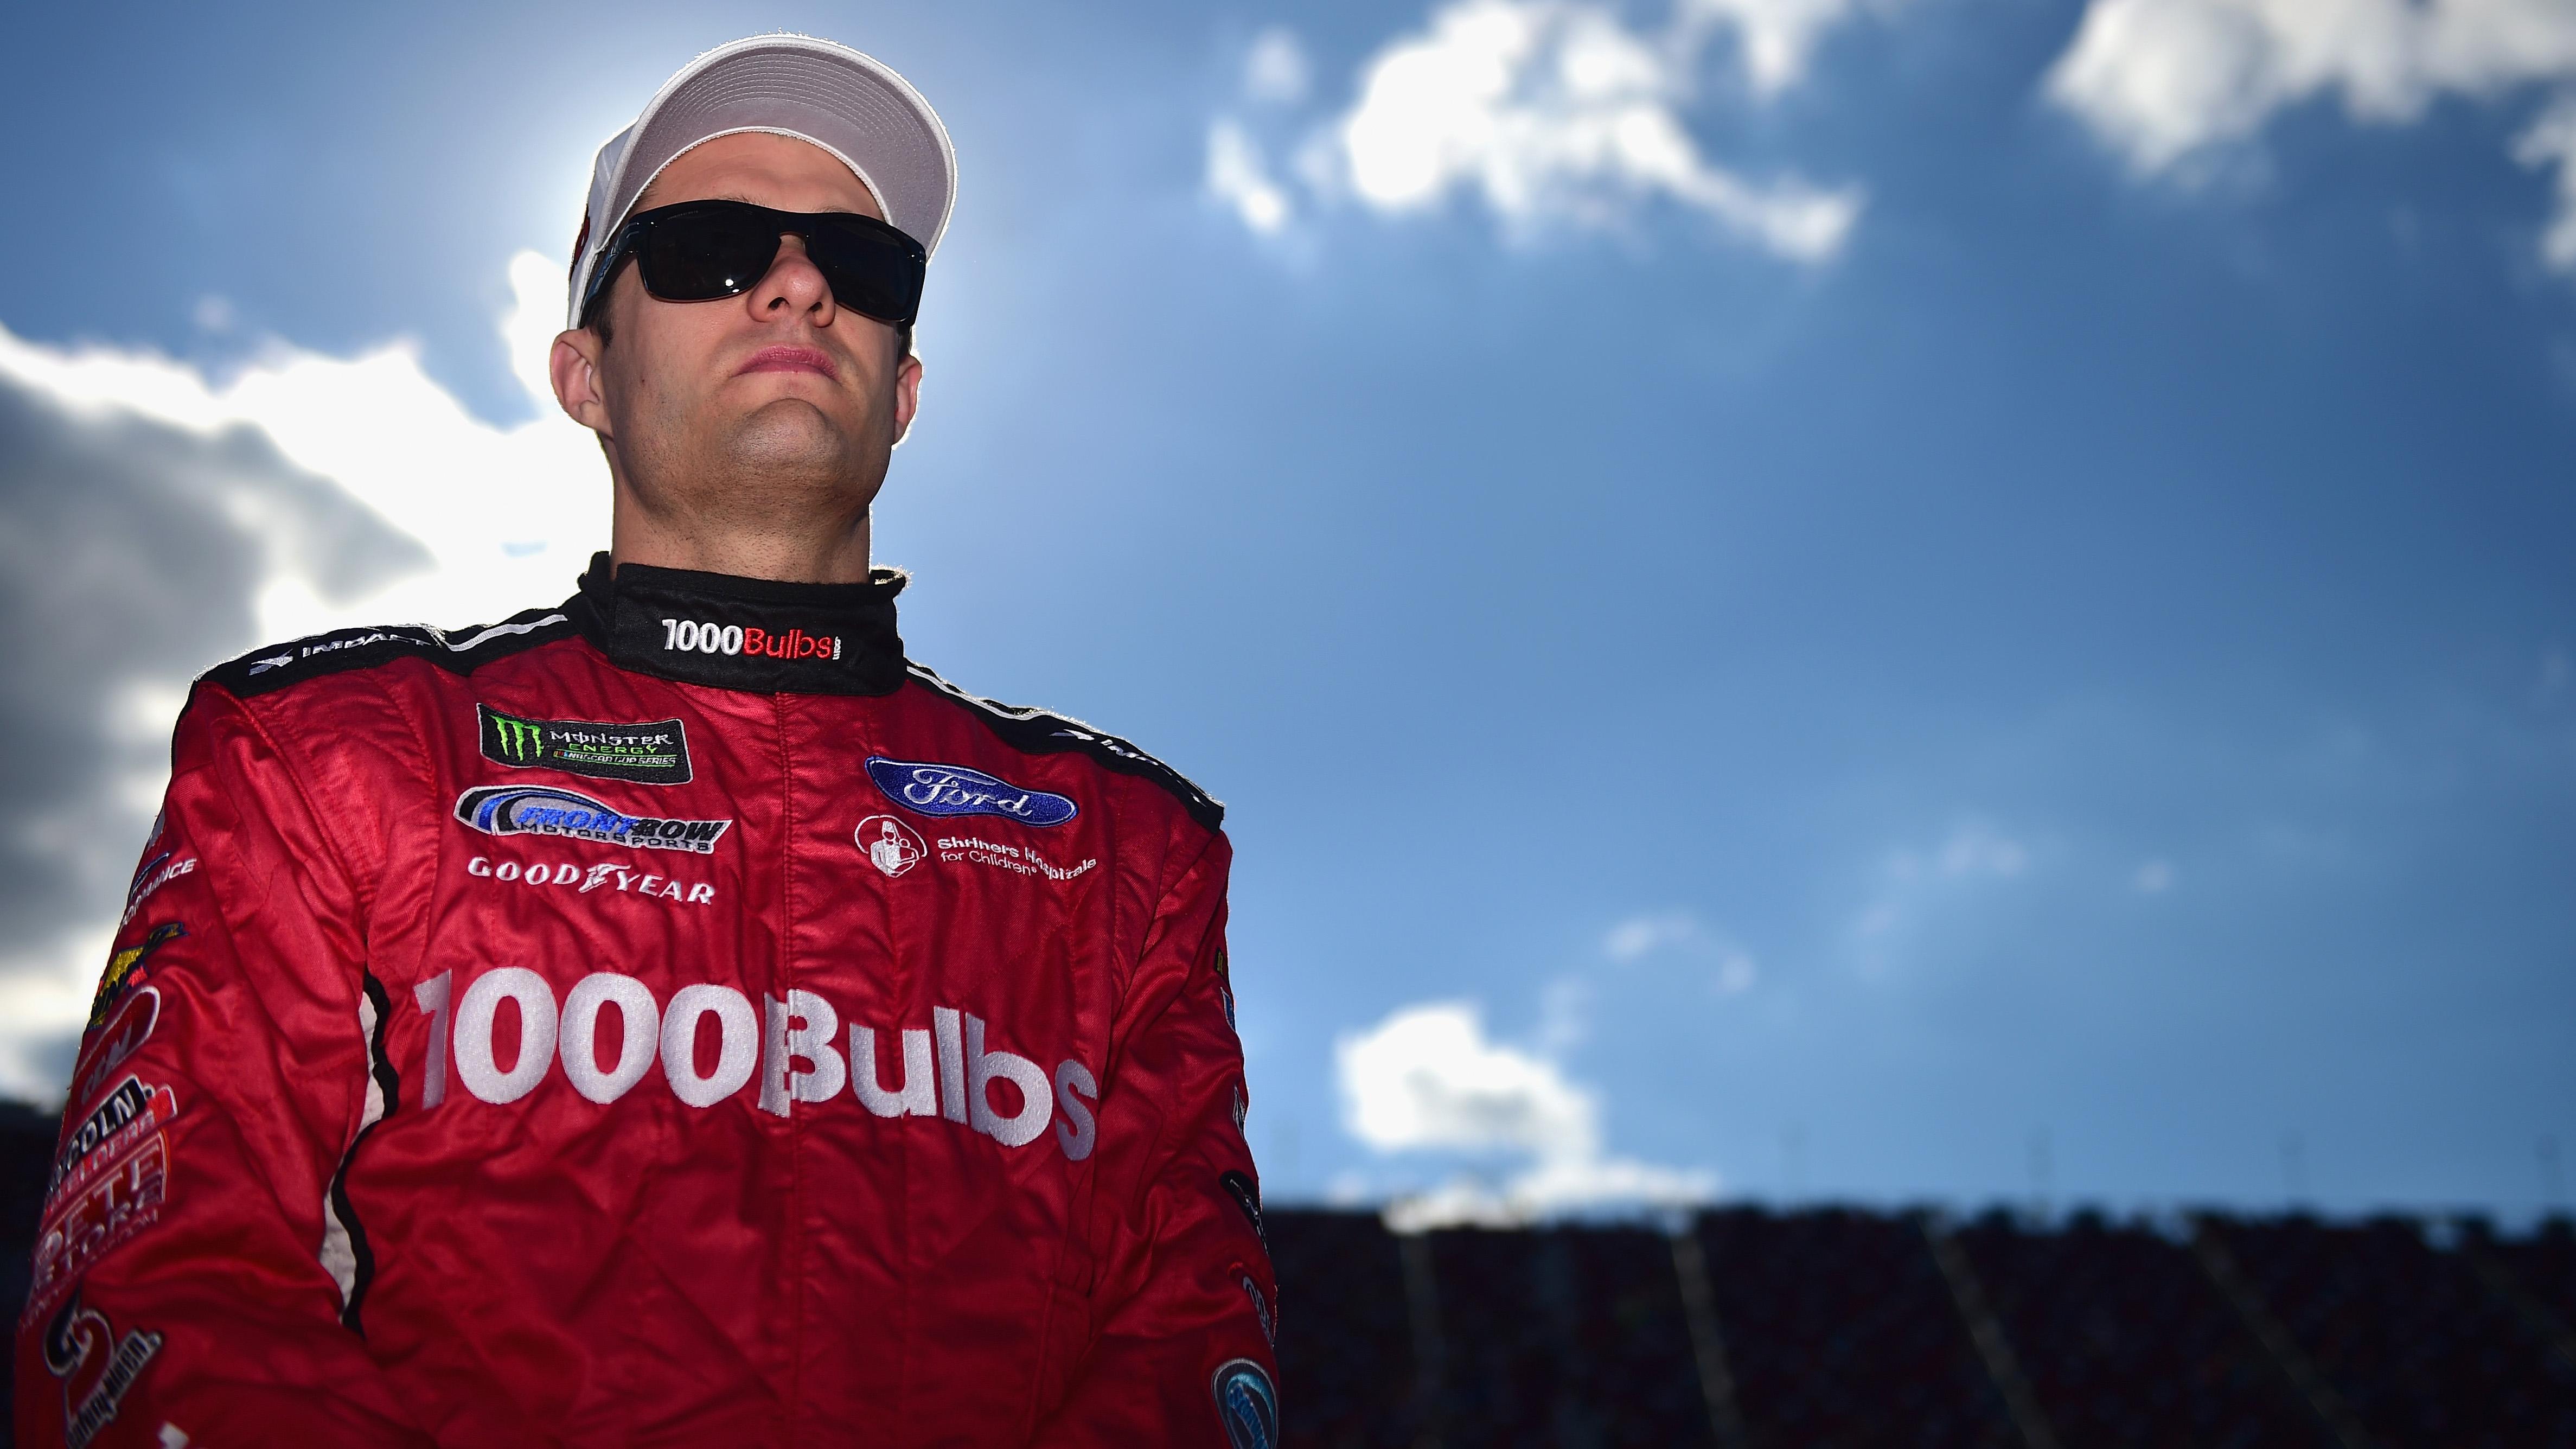 NASCAR: Top five upsets at Talladega Superspeedway